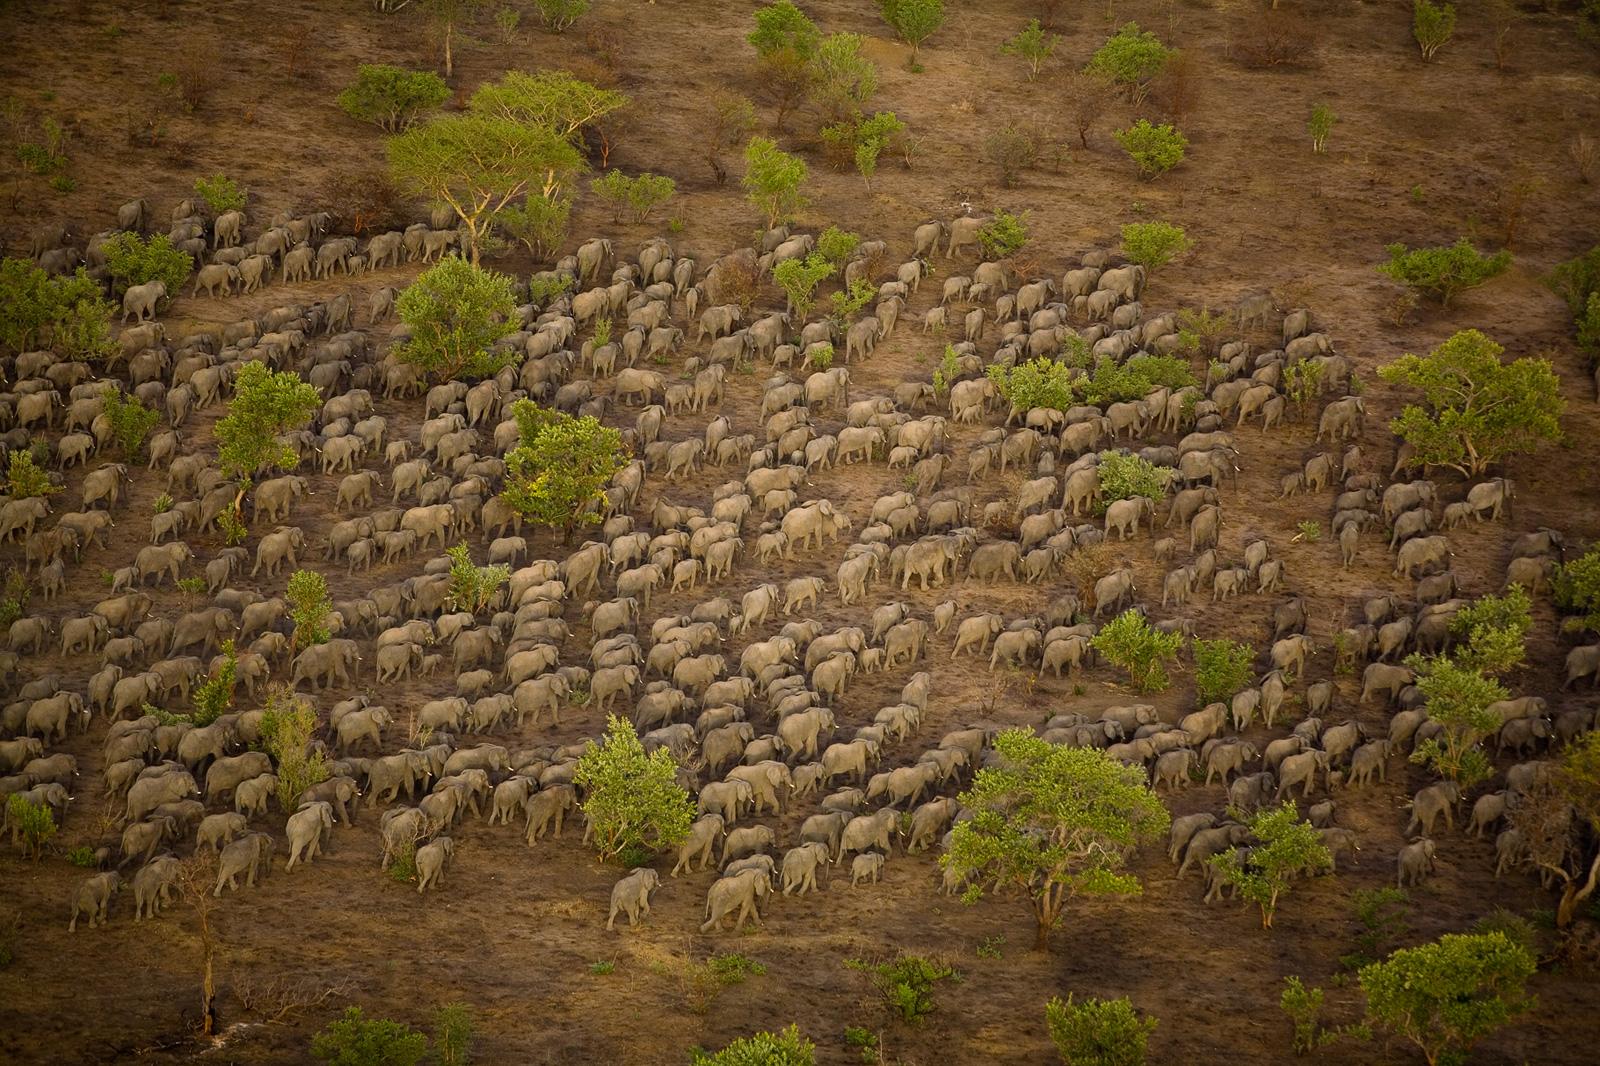 elephant-herd-zakouma